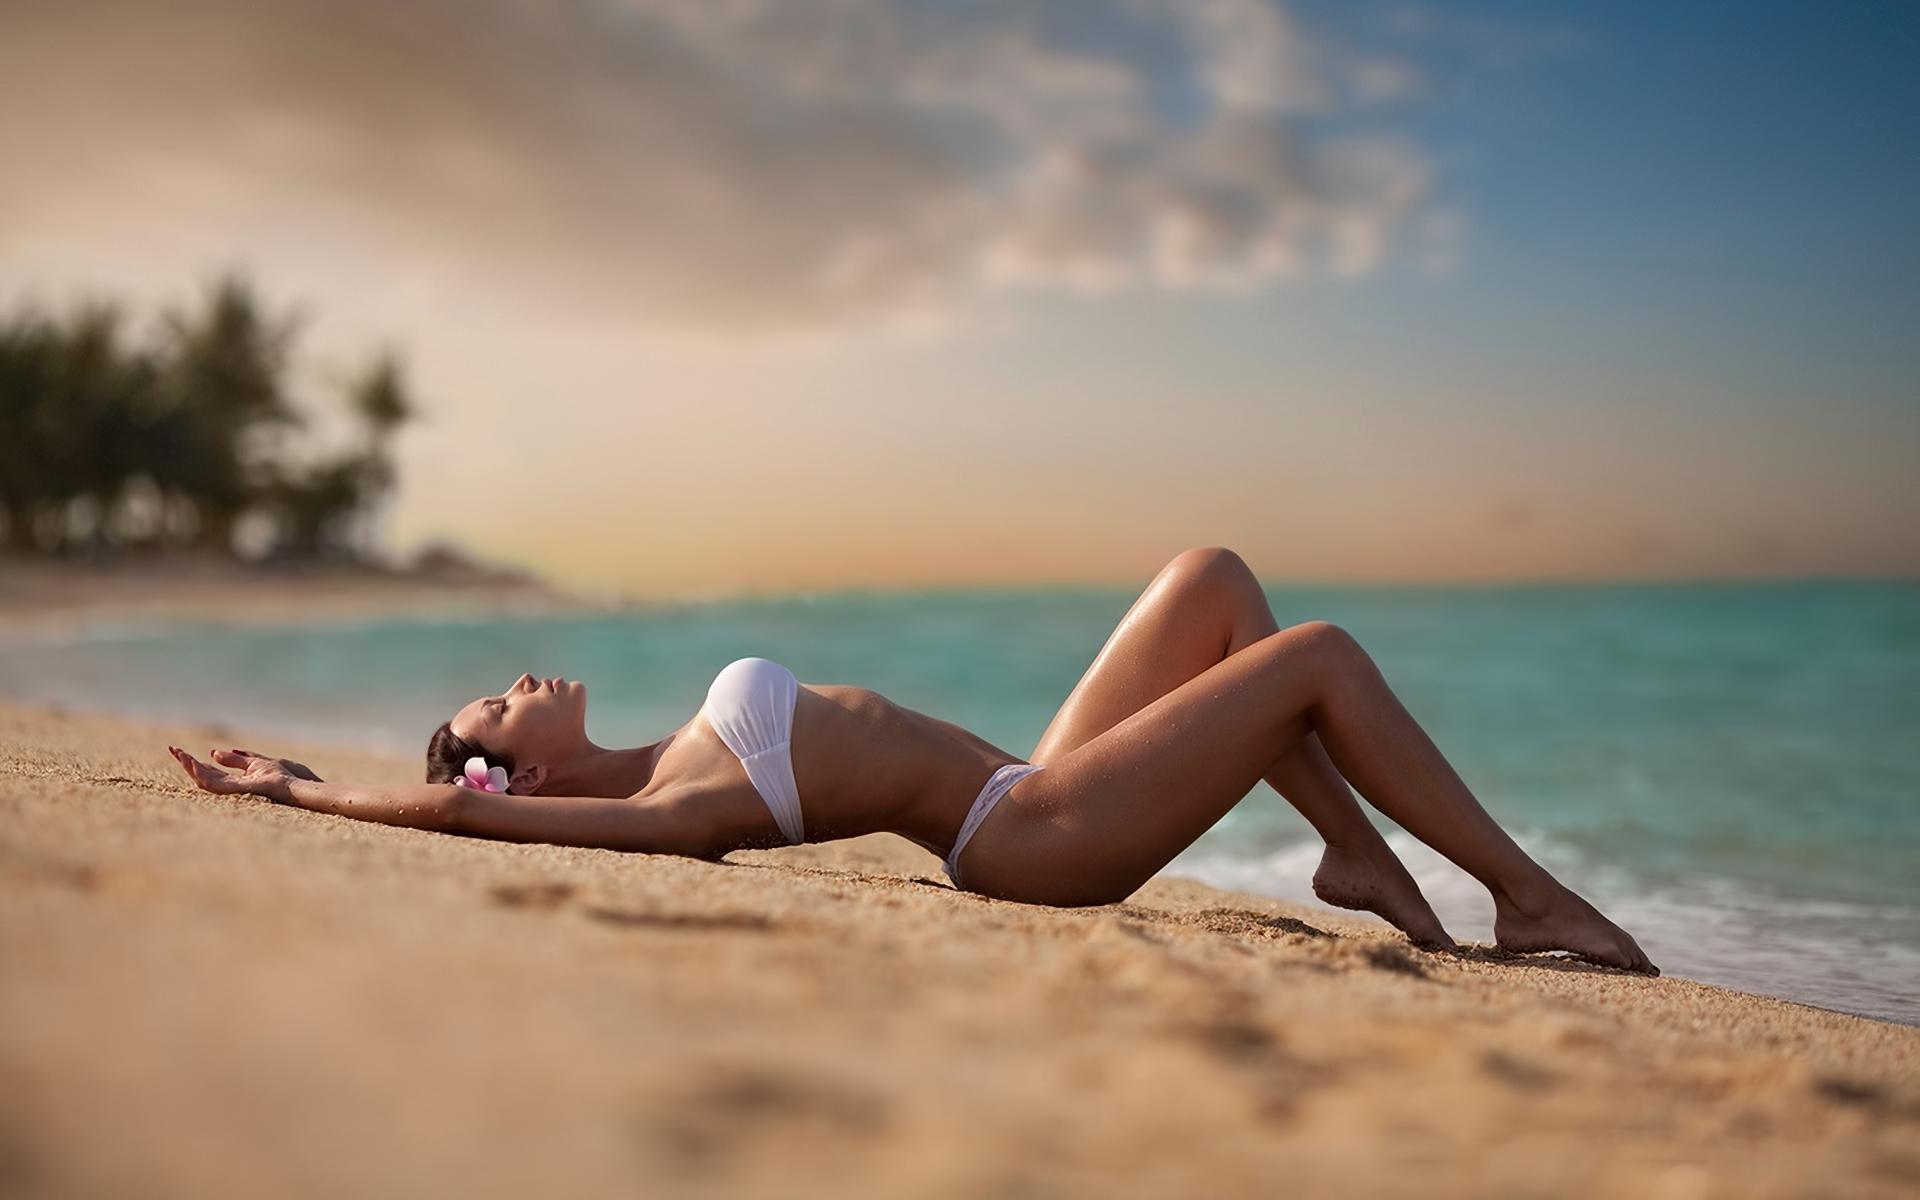 Картинки девушки на пляже